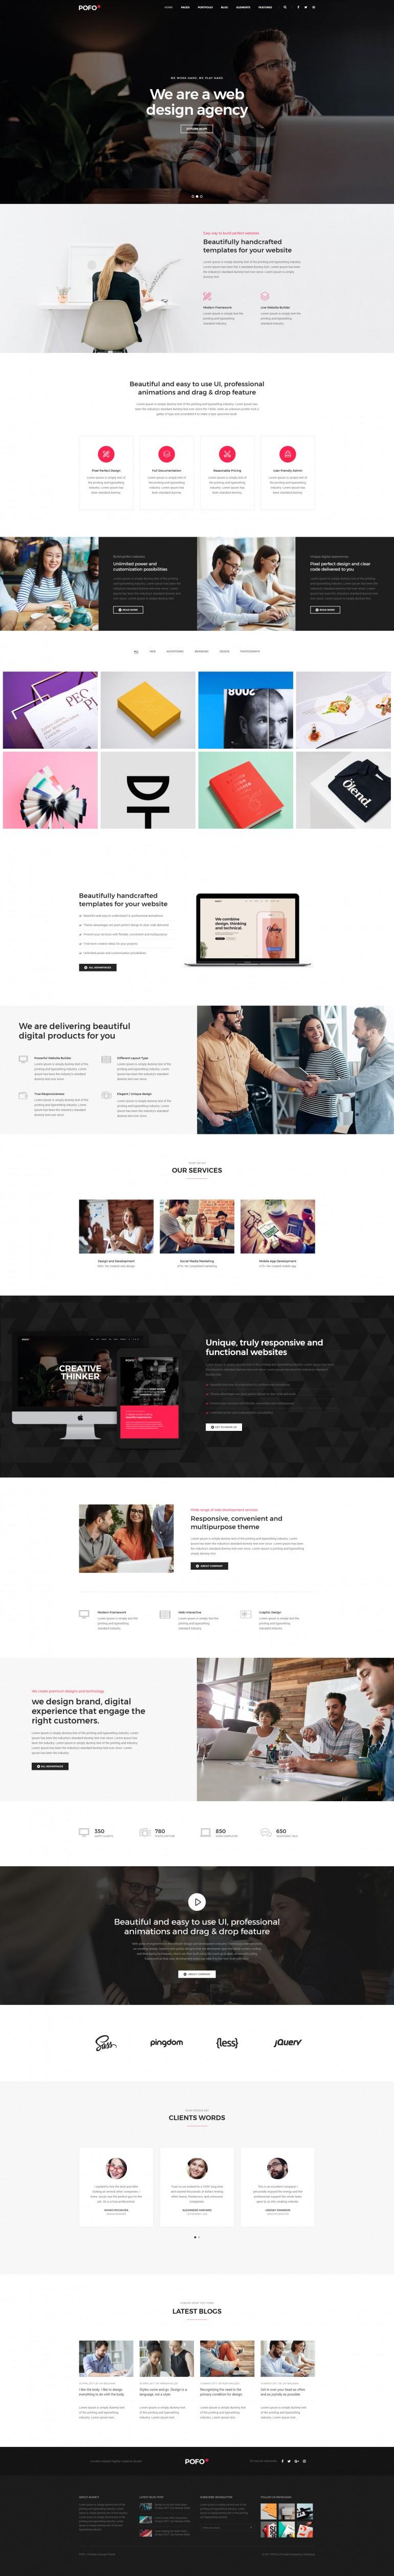 Pofo Creative WordPress Theme – Classic Corporate